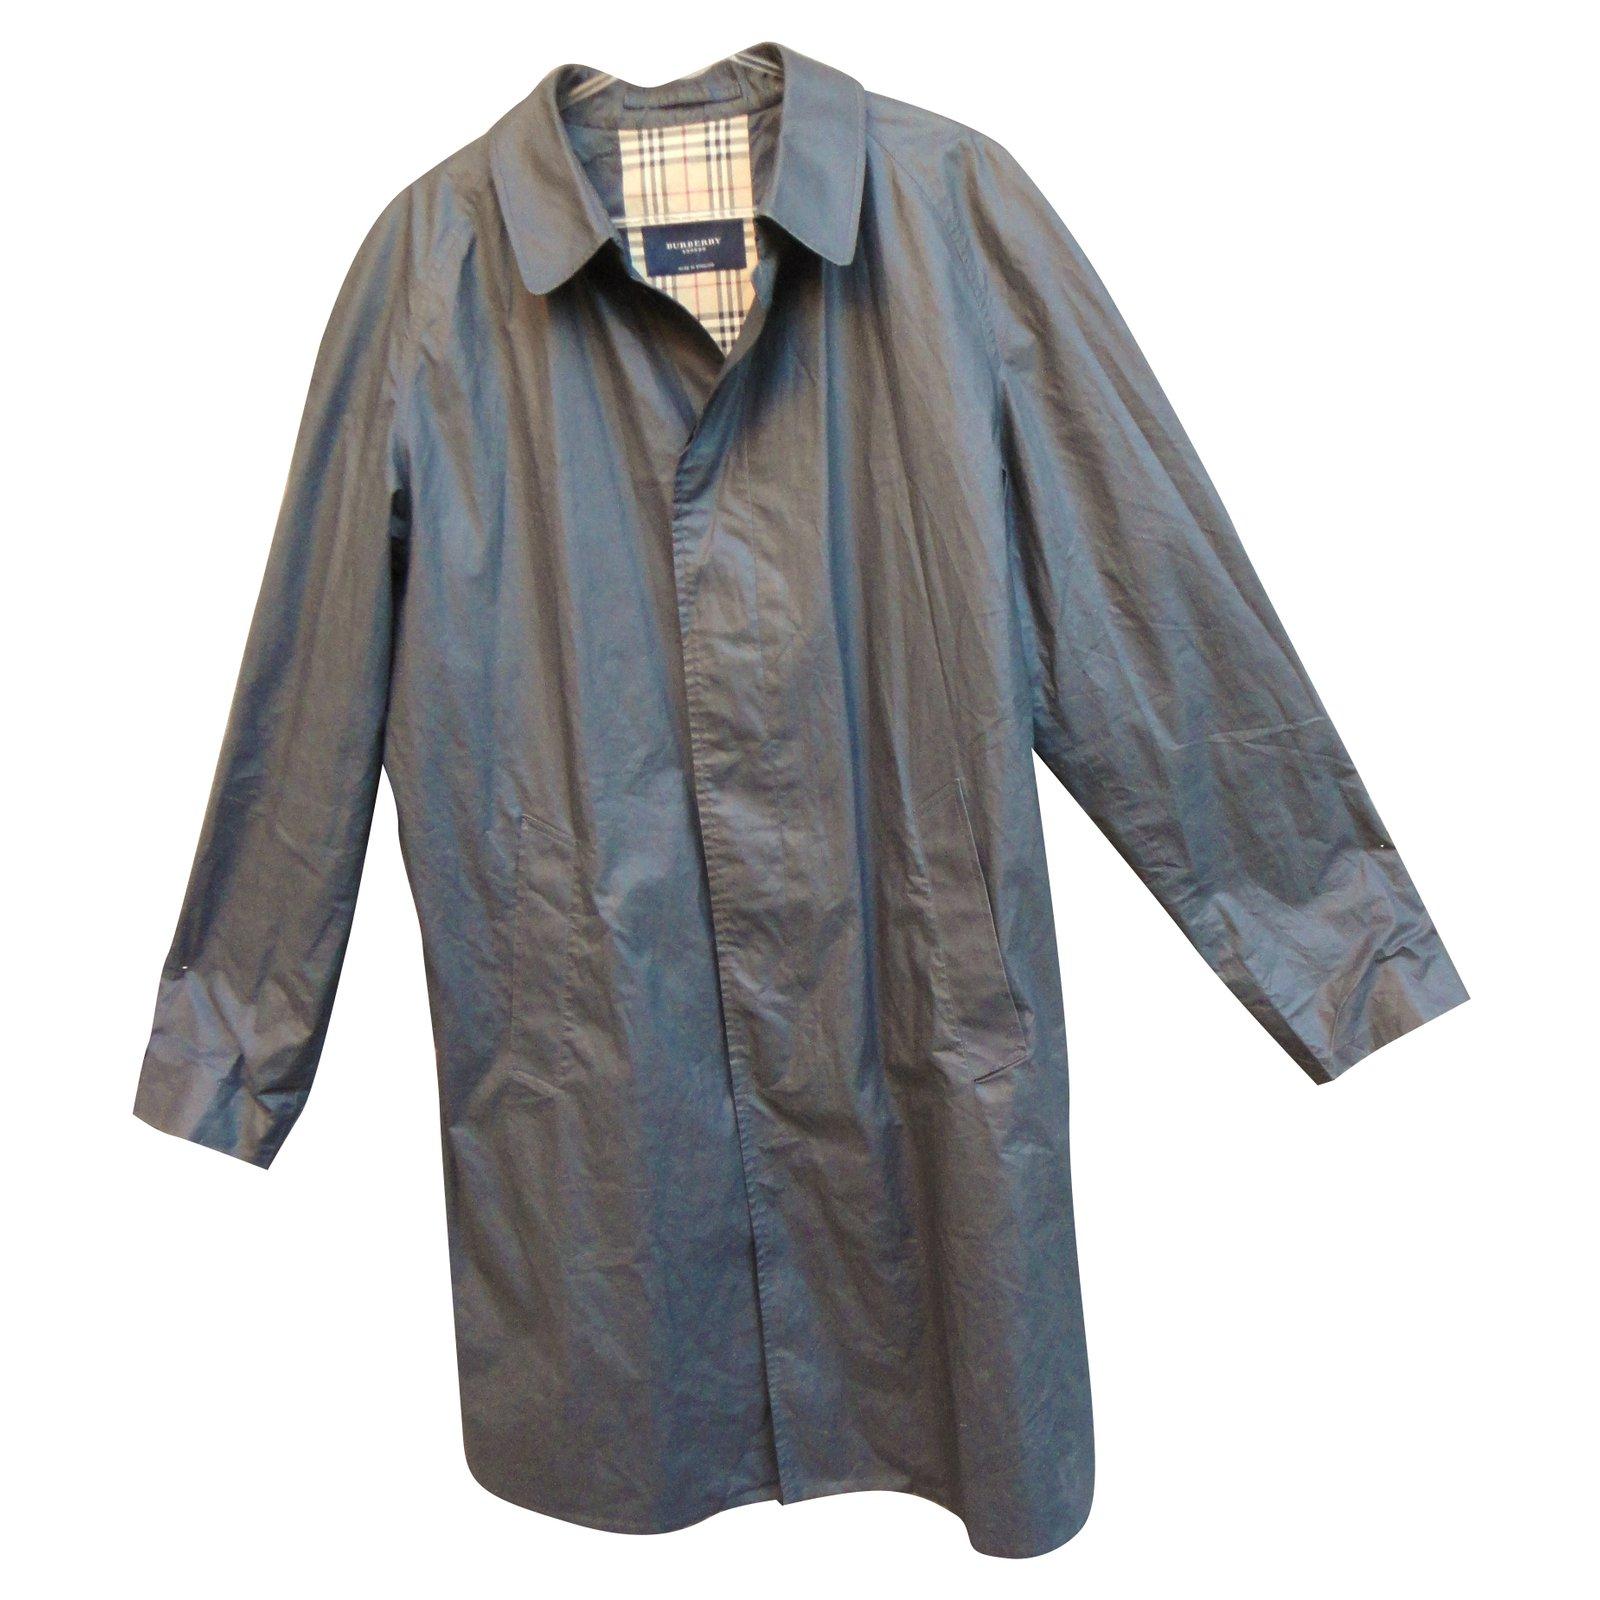 Anthracite Coat Ref Homme Manteaux 40775 Coton Burberry Trench Gris  wFxgwHzPn 560c67c2694